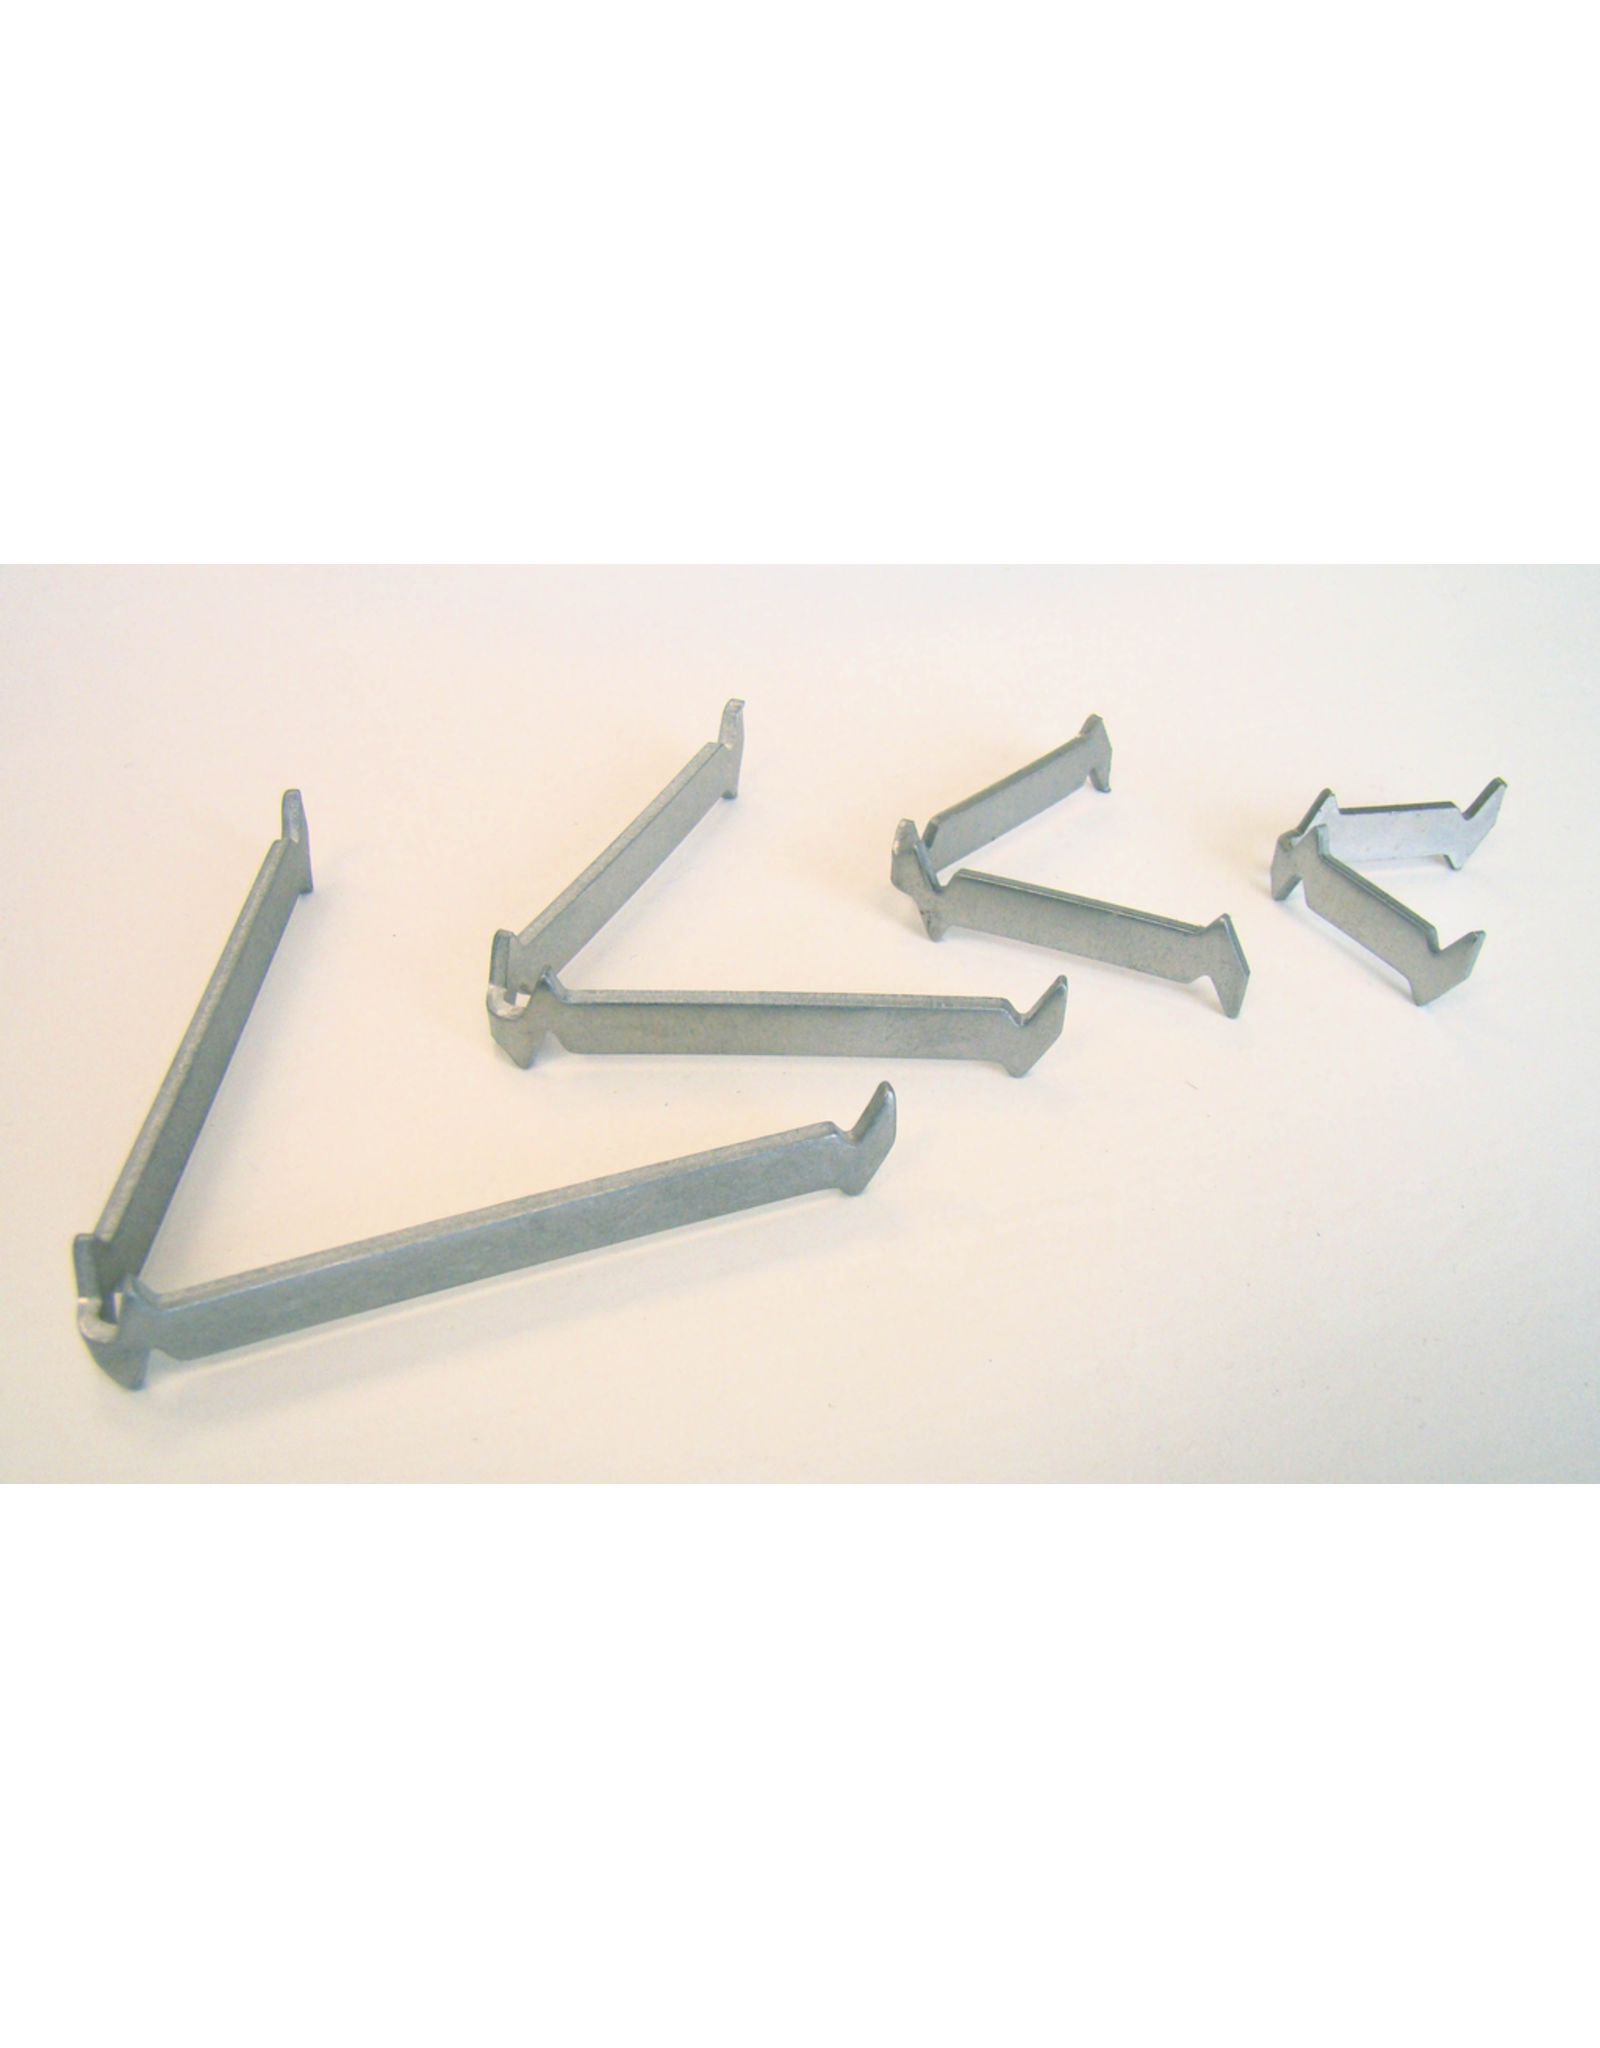 Metal Stilt 65mm